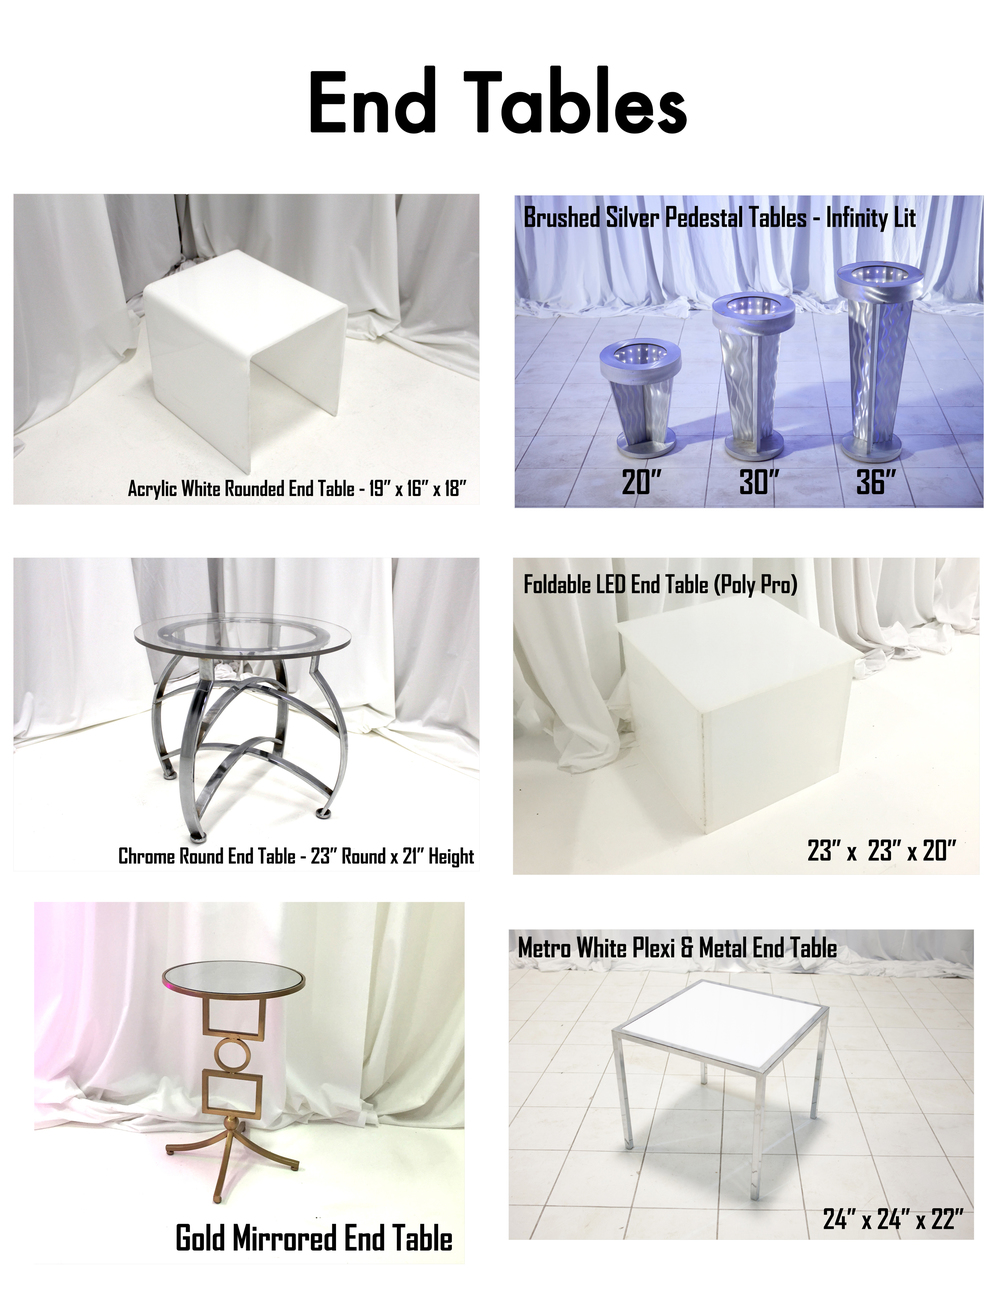 P47_End Tables.jpg